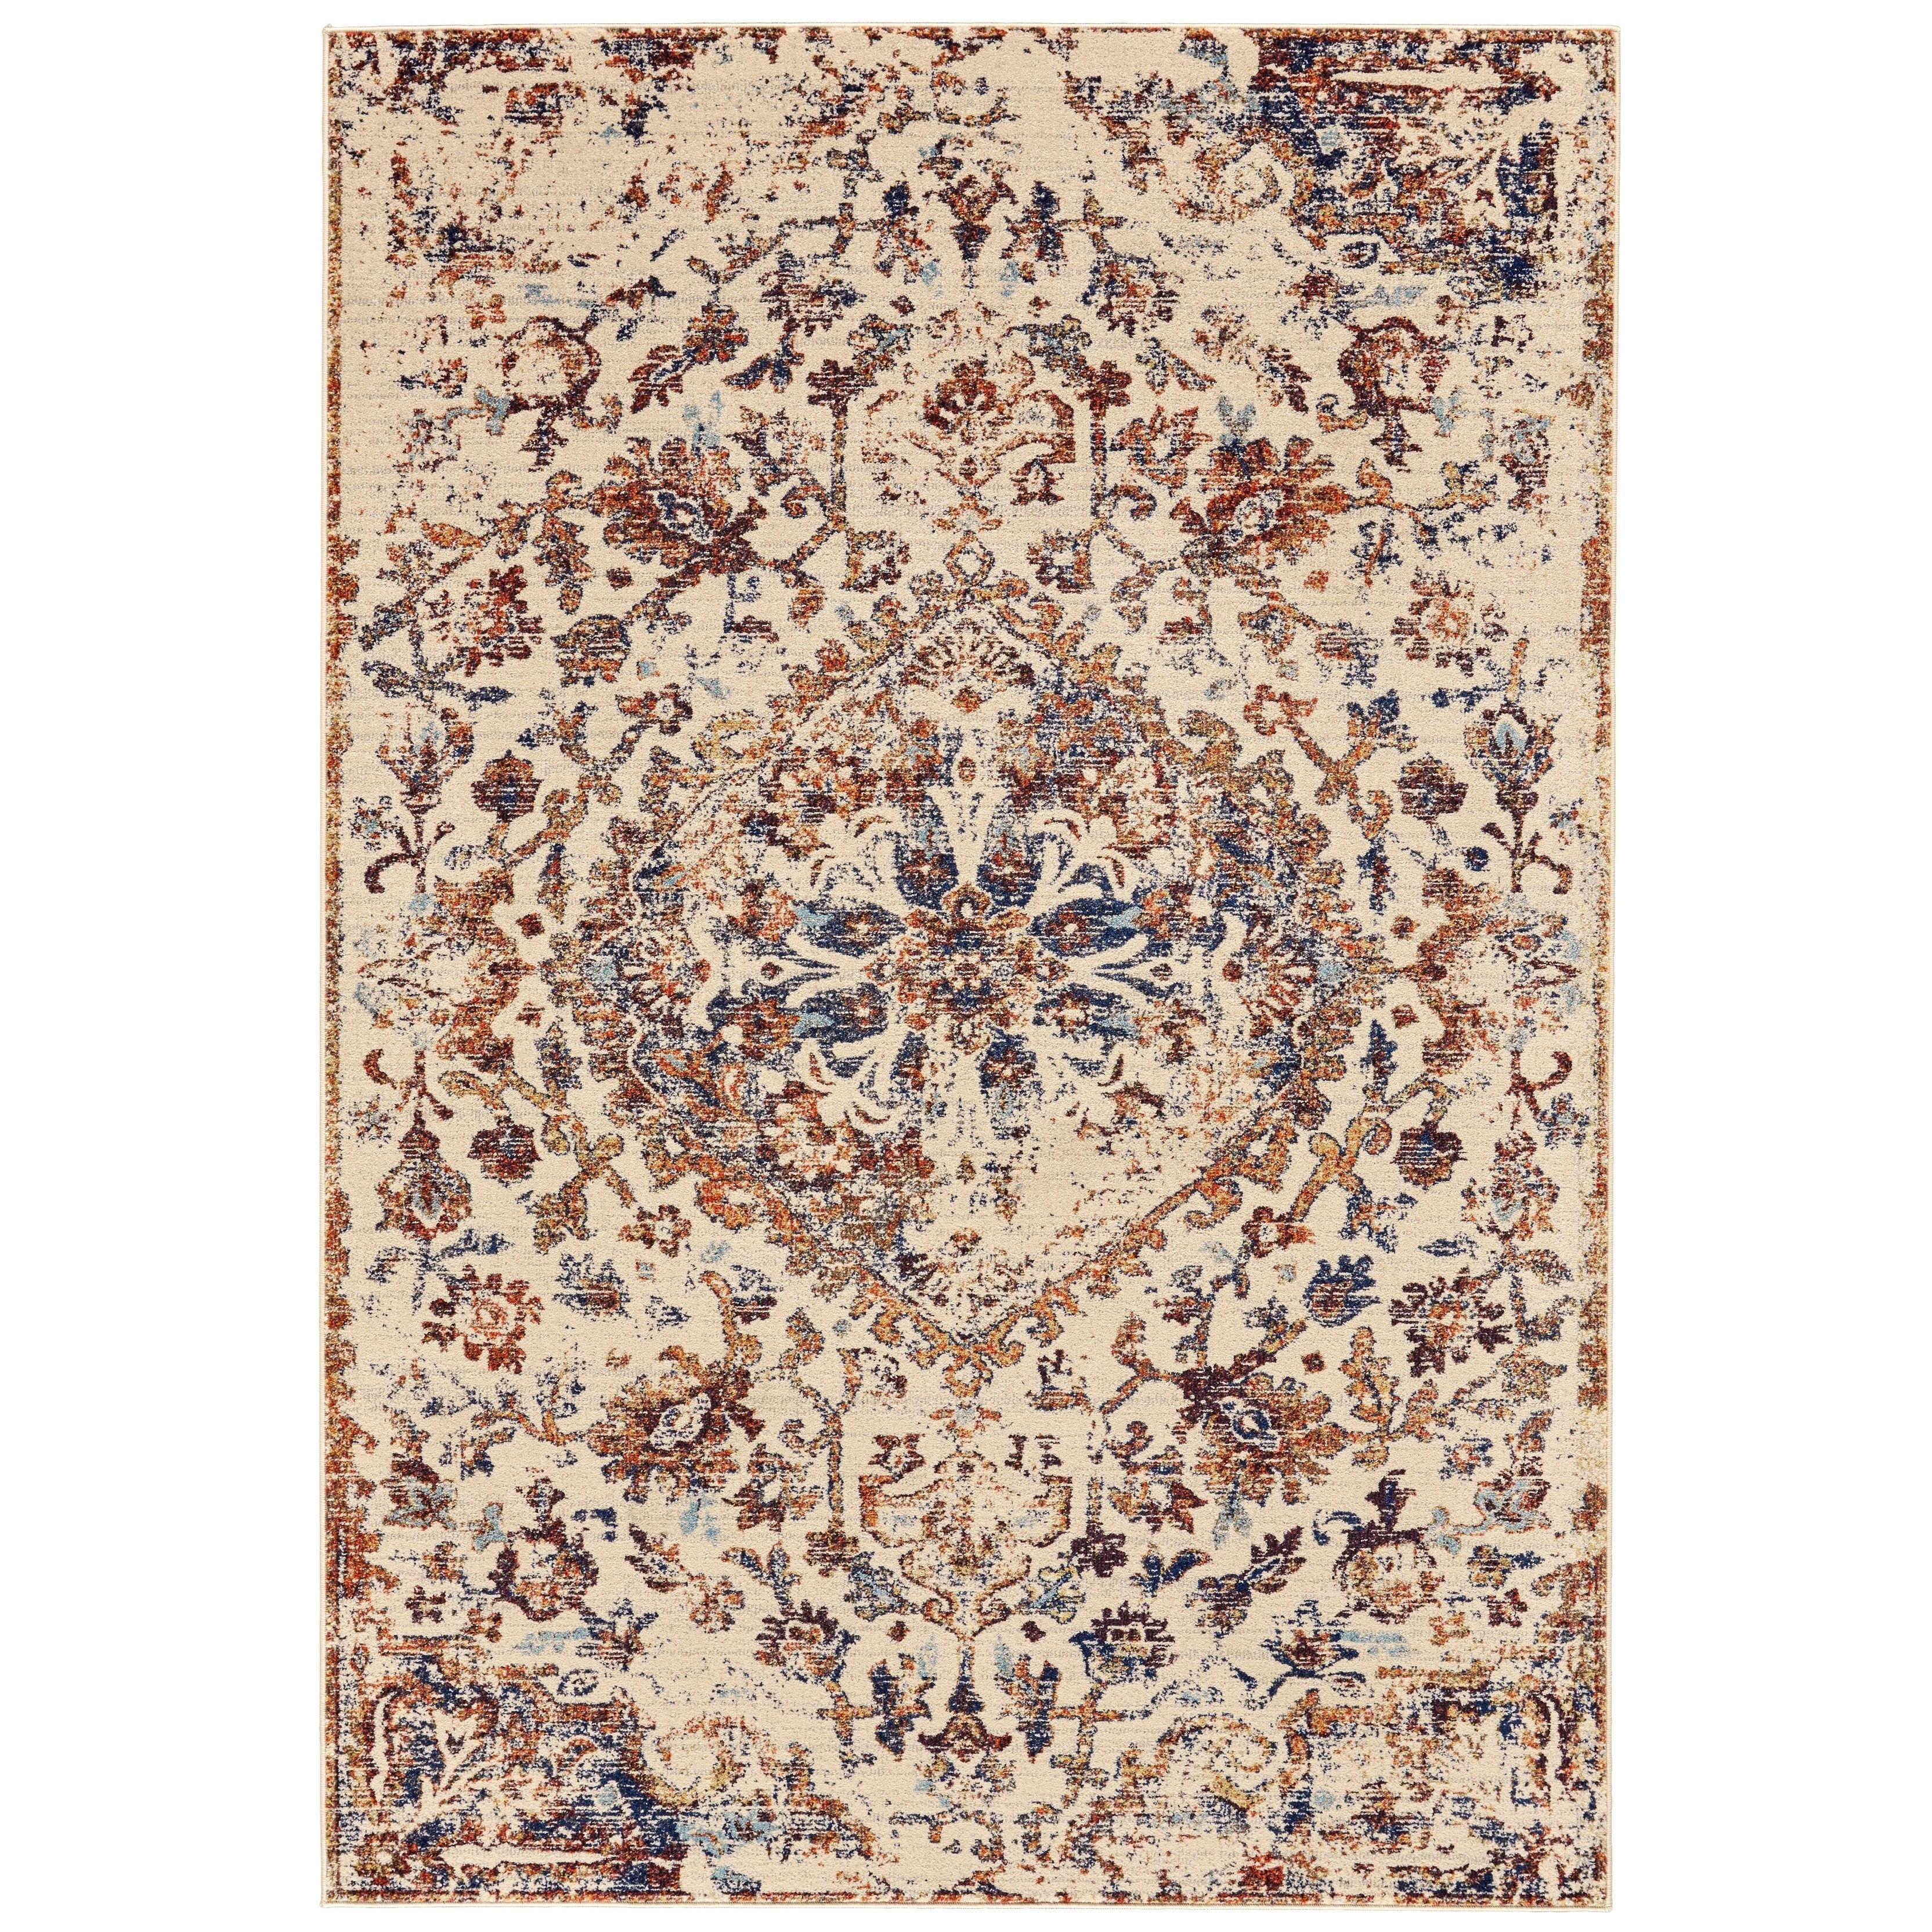 Grand Bazaar Zenith Cotton Silver Wool Rug 8 X 11 8 X 11